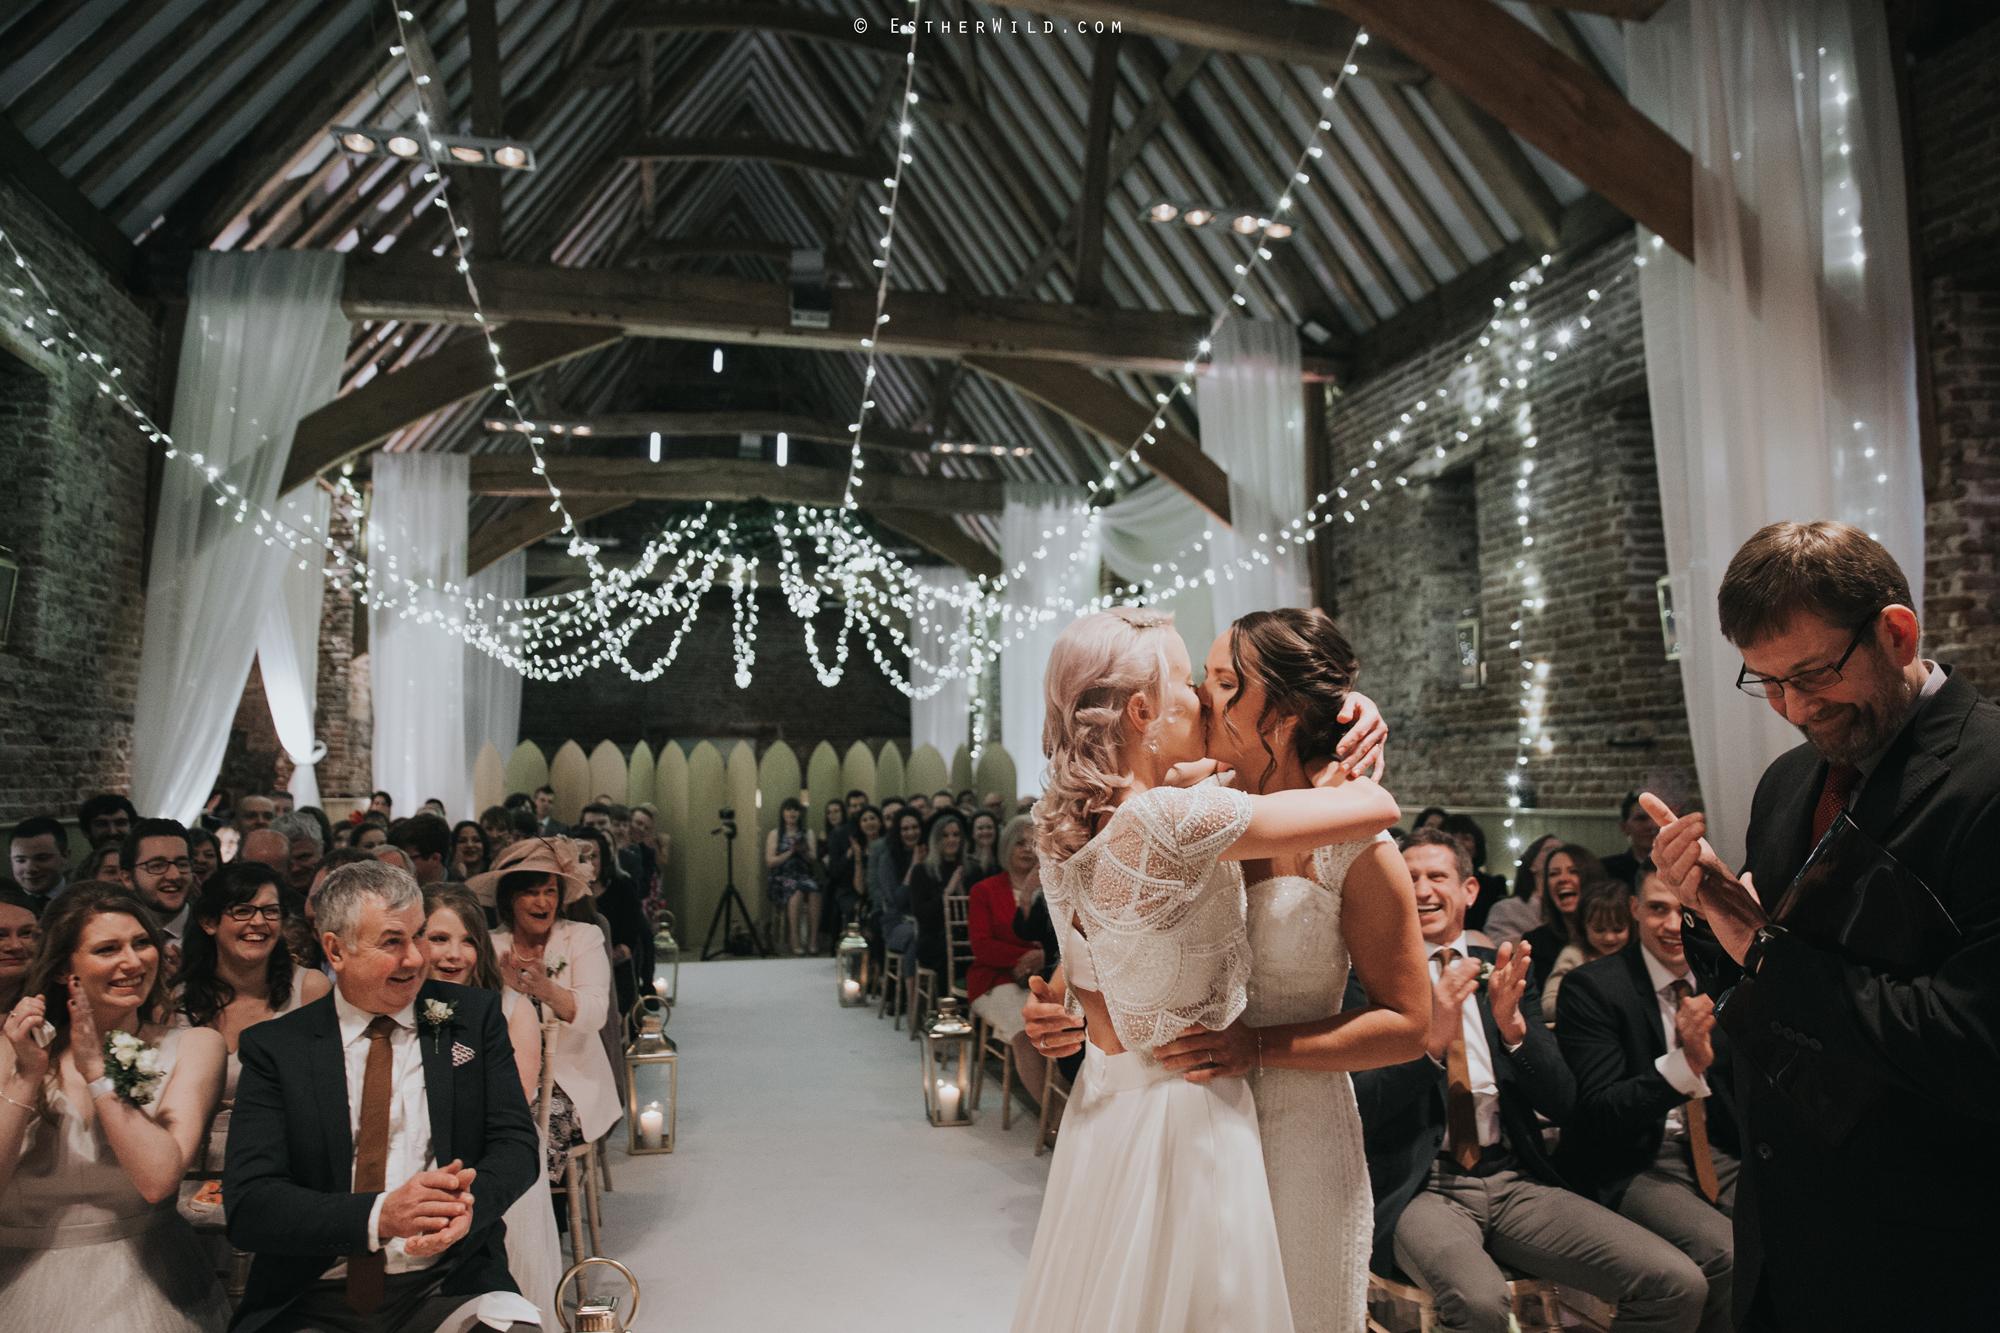 Elms_Barn_Weddings_Suffolk_Photographer_Copyright_Esther_Wild_IMG_1264.jpg